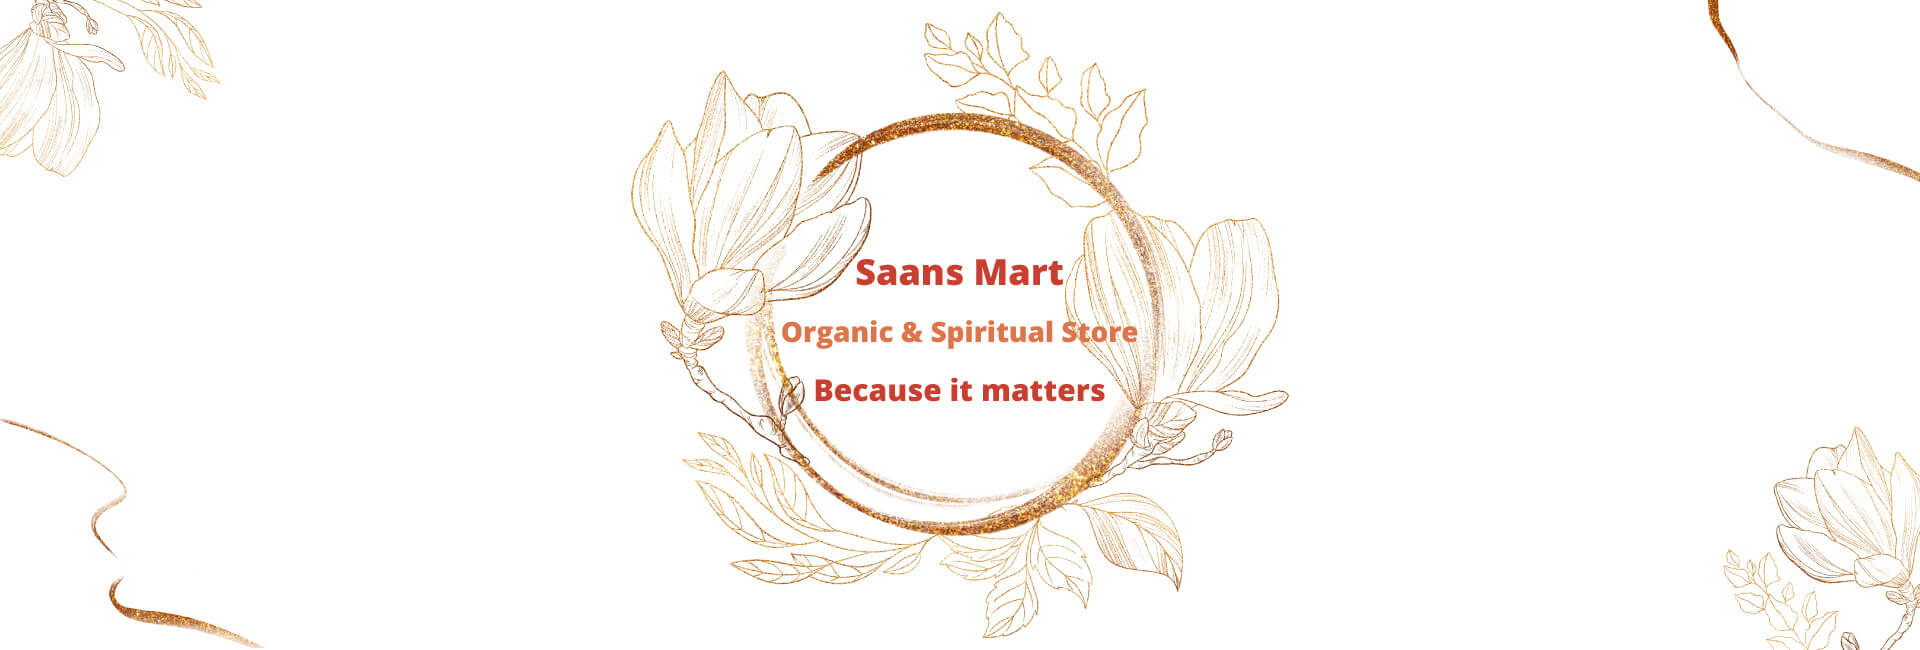 Saans-Mart-Spiritual-Organic-Store